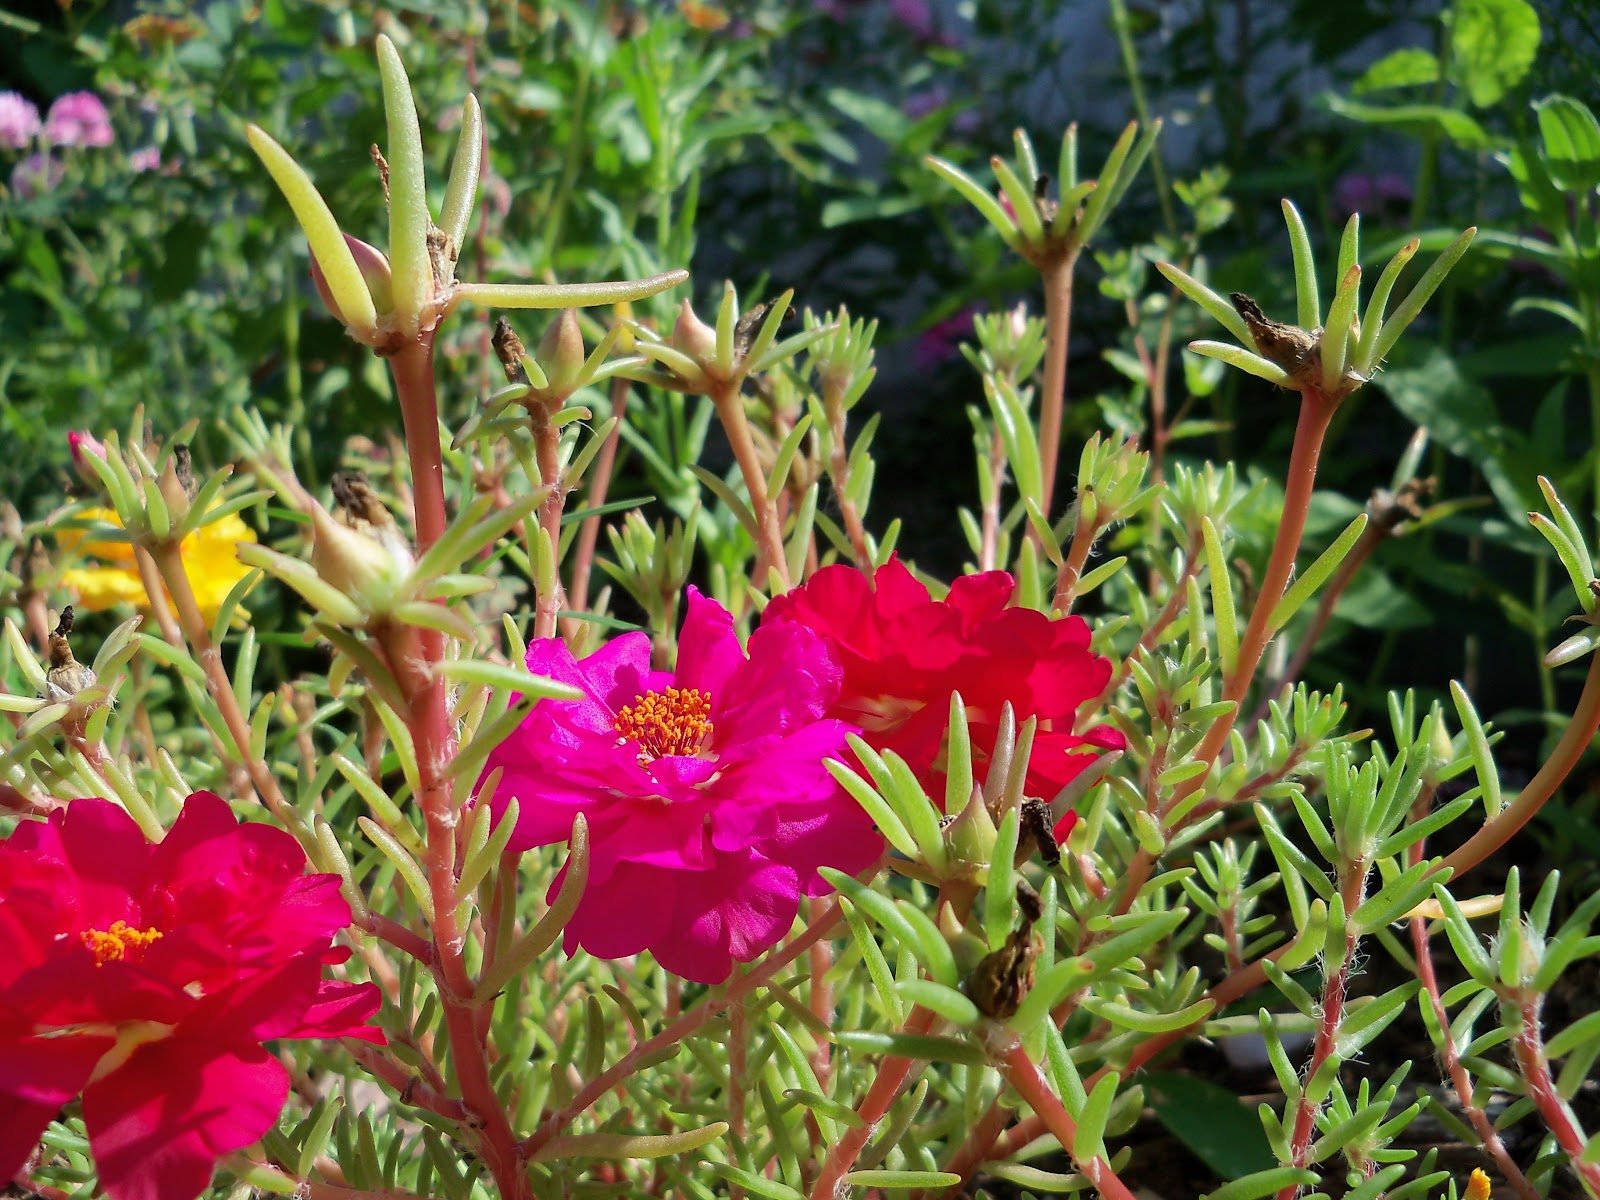 Gardening 2010, Part Two - 101_2594.JPG